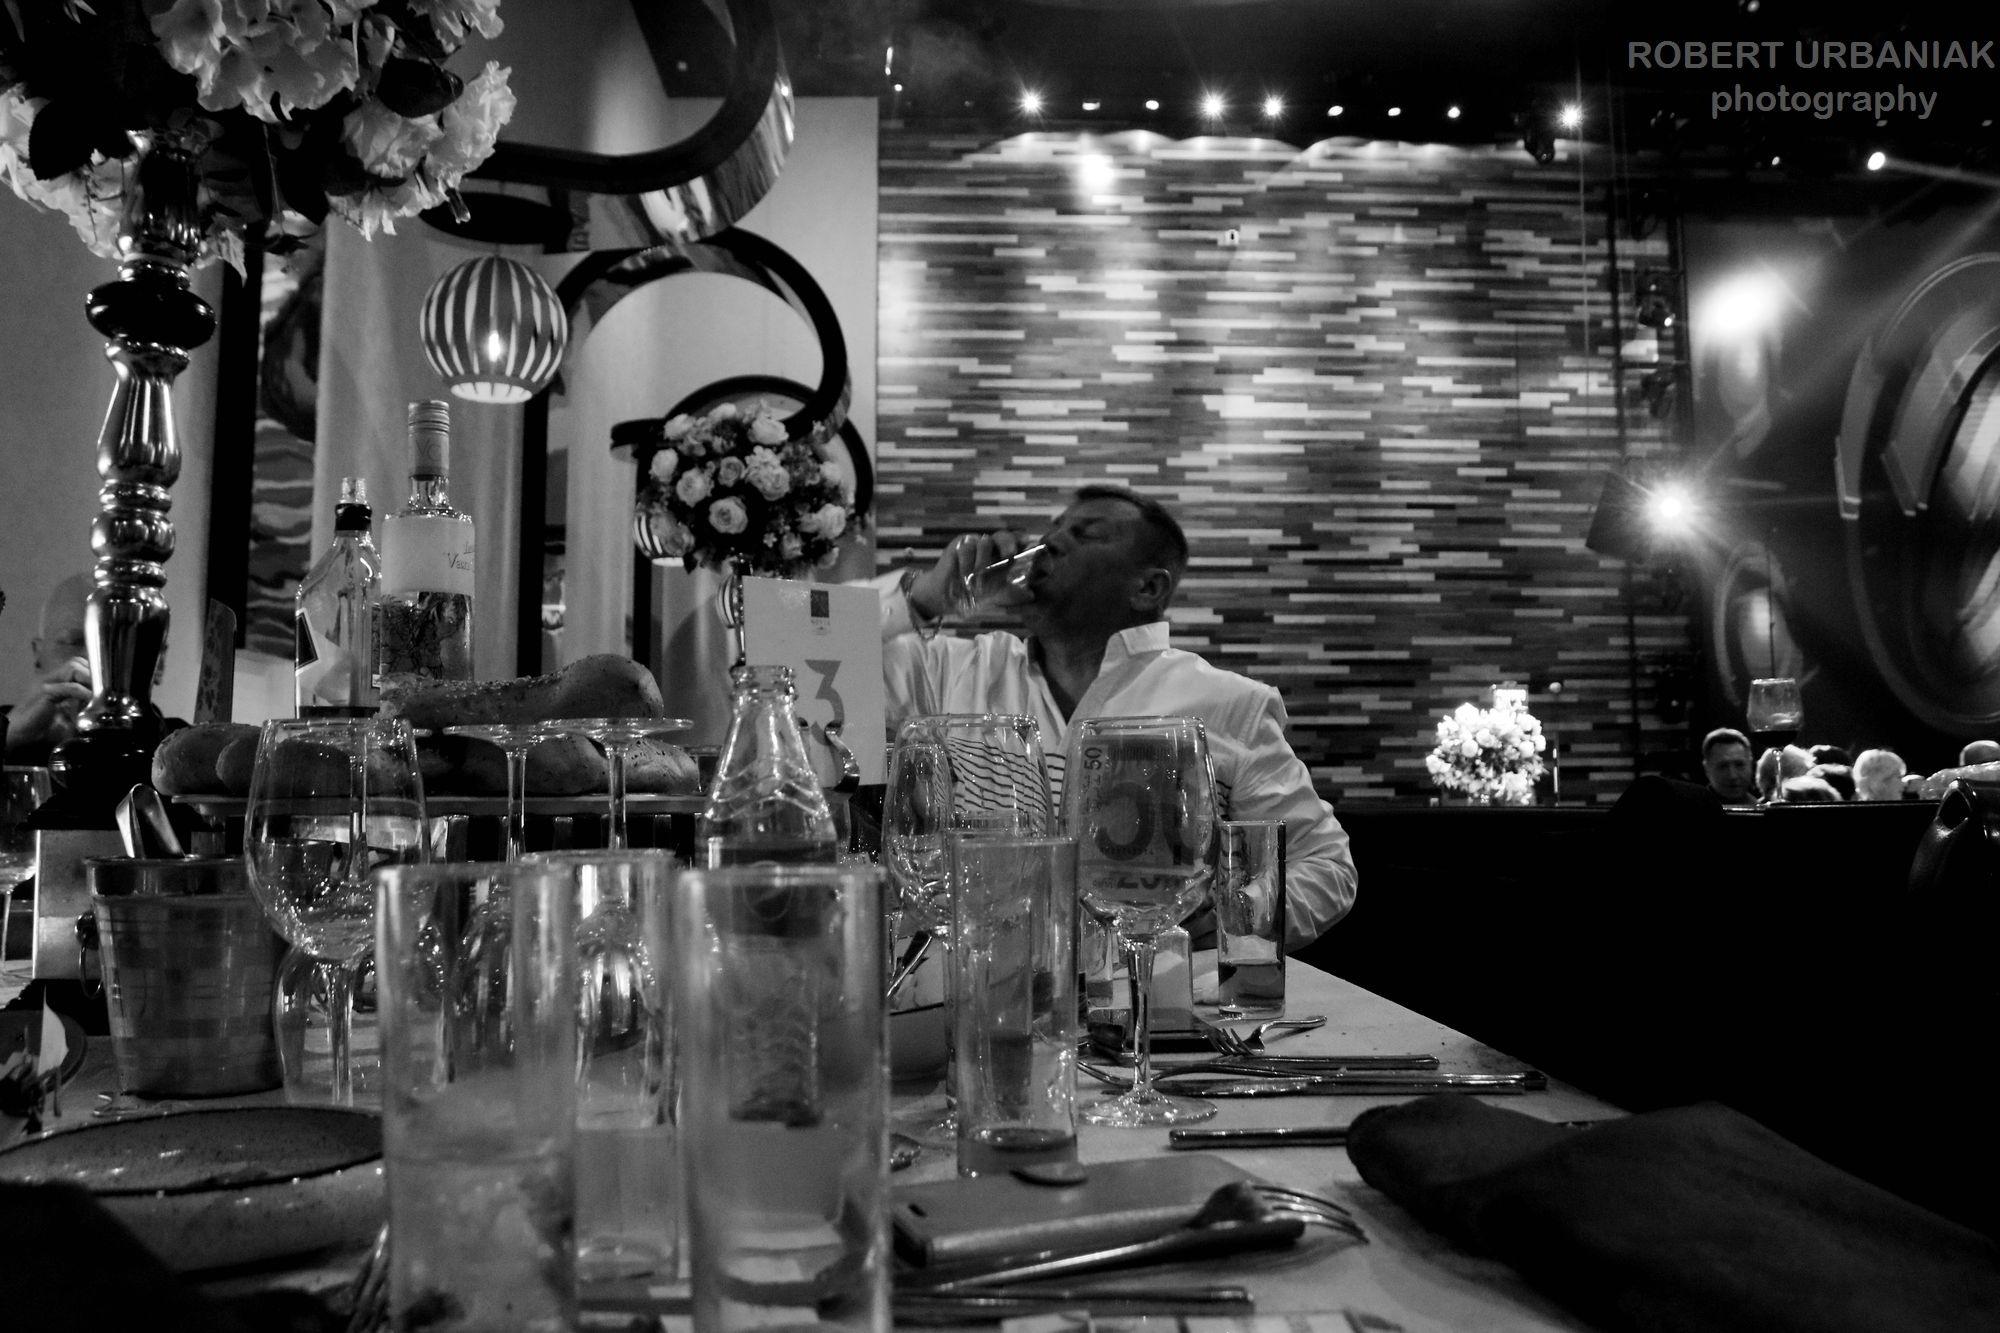 alone drink by Robert Urbaniak